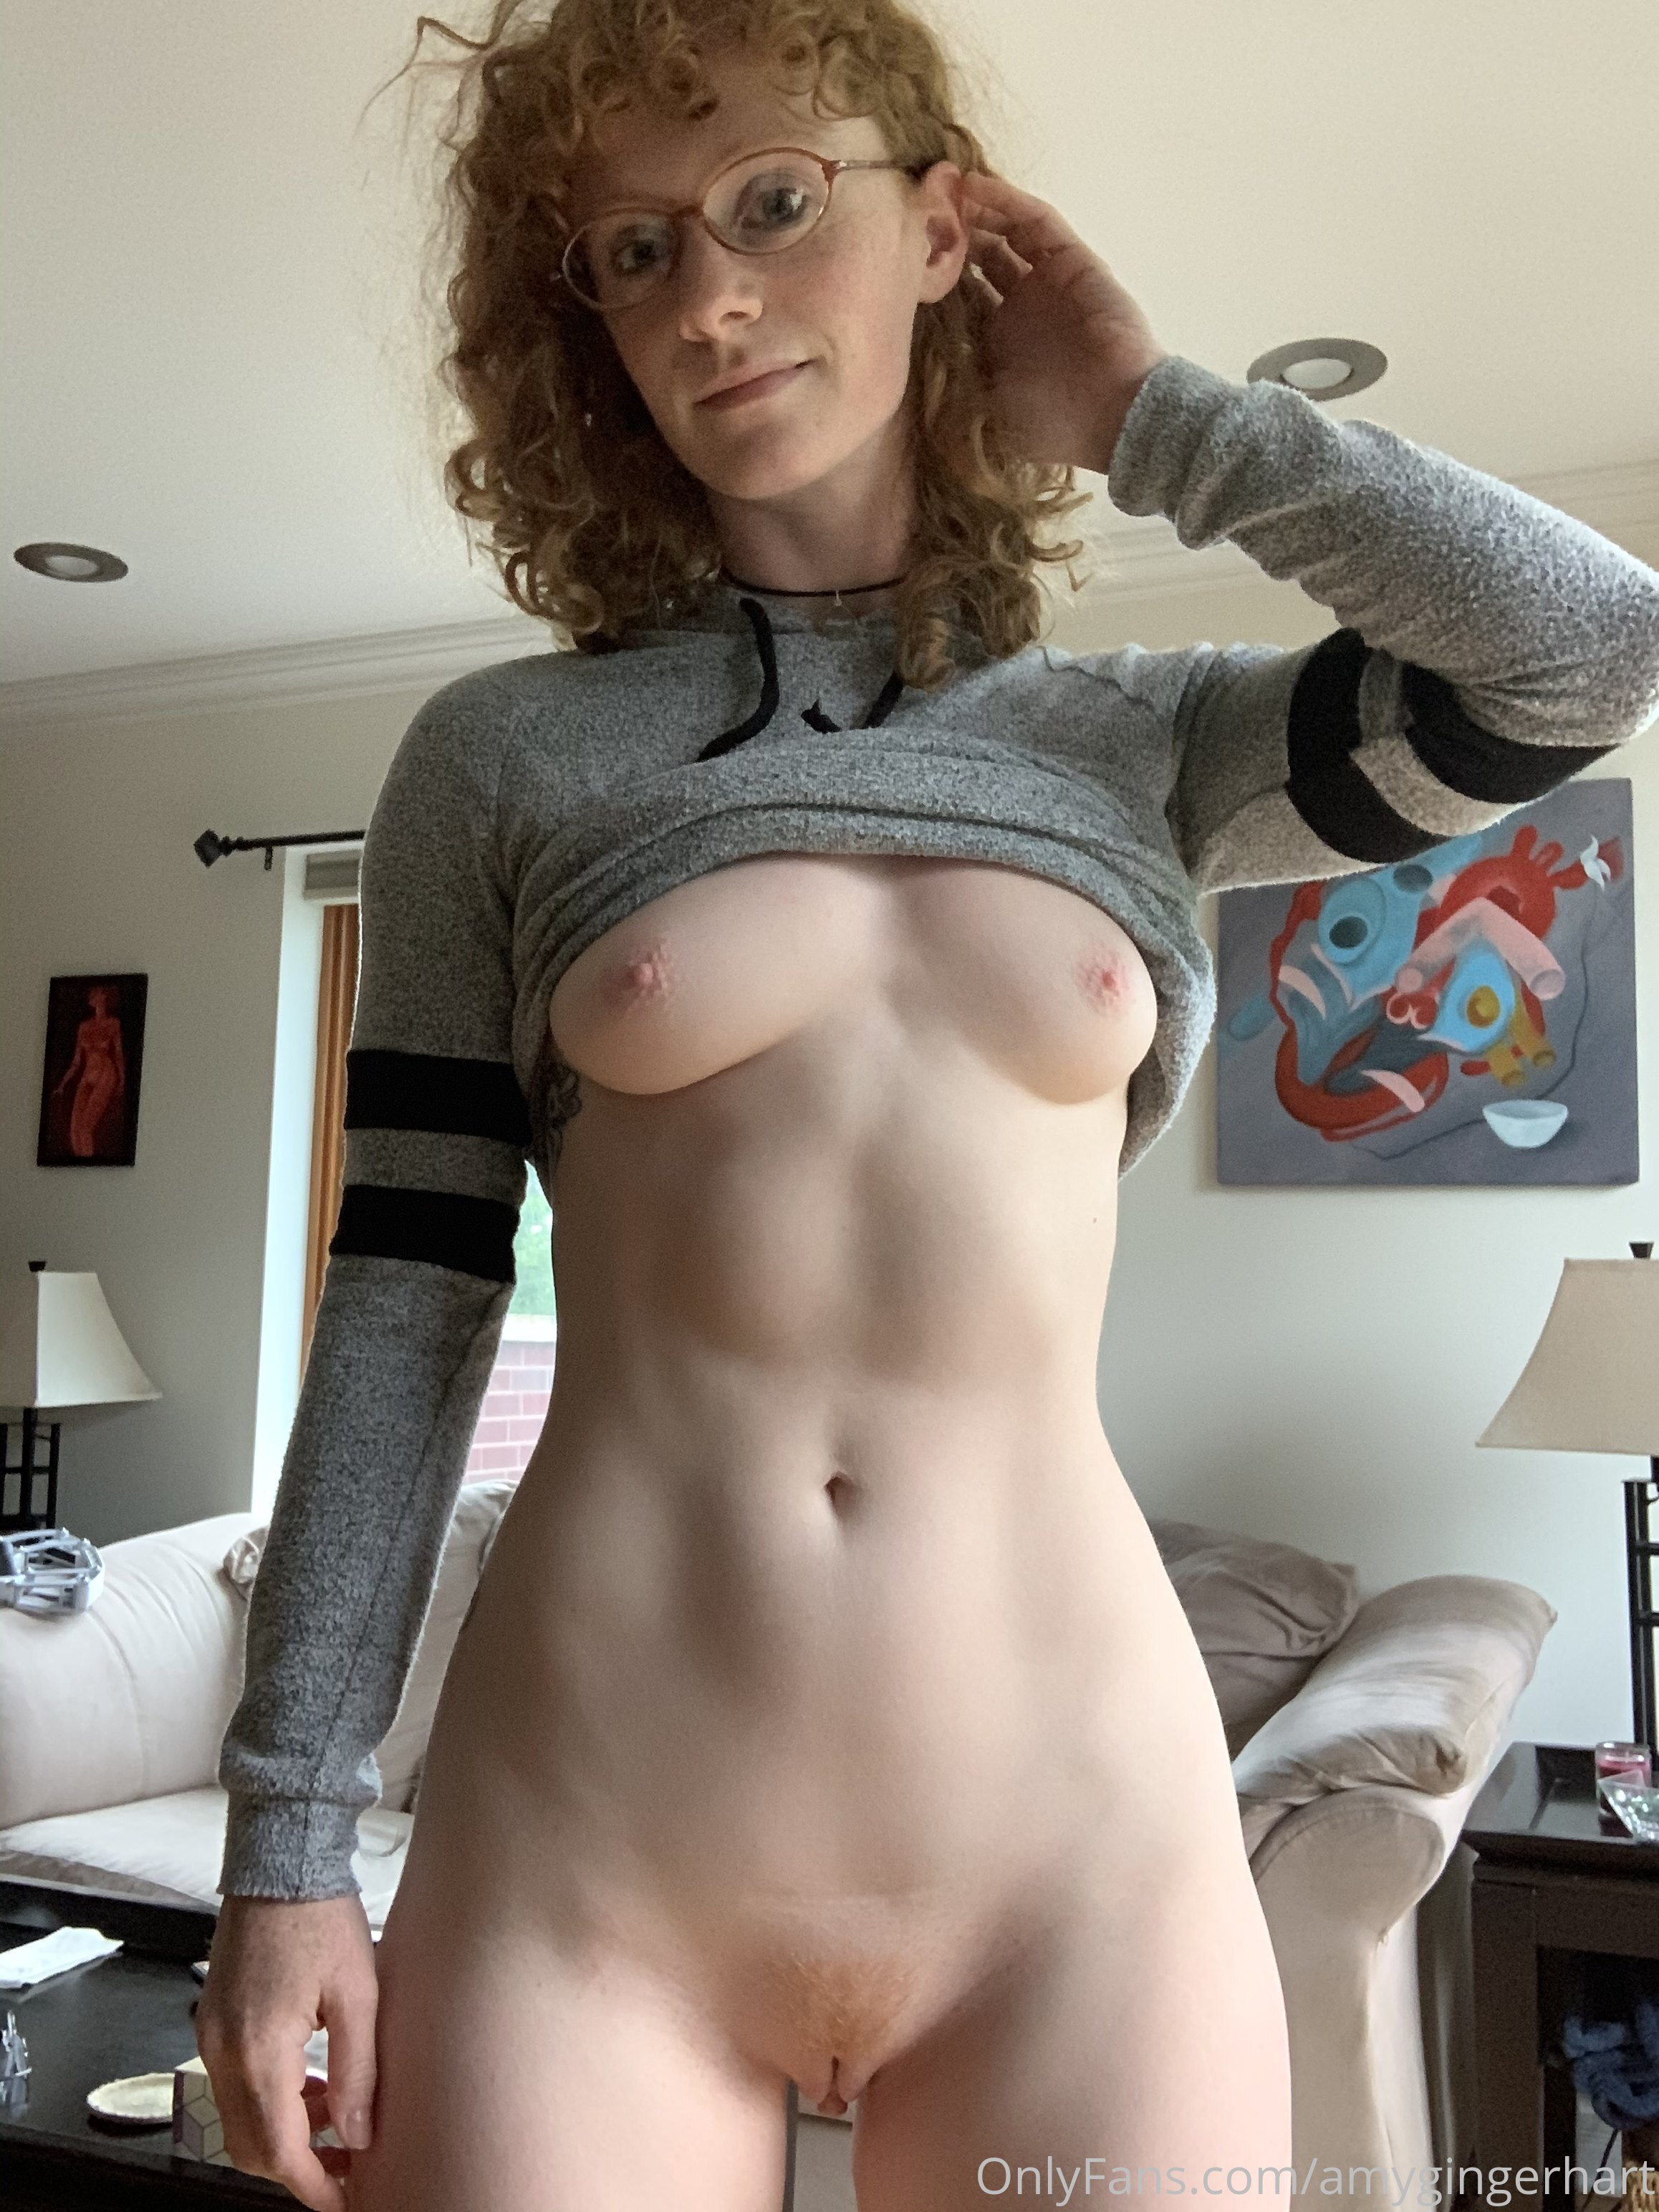 Amy Hart, Amygingerhart, Onlyfans 0064